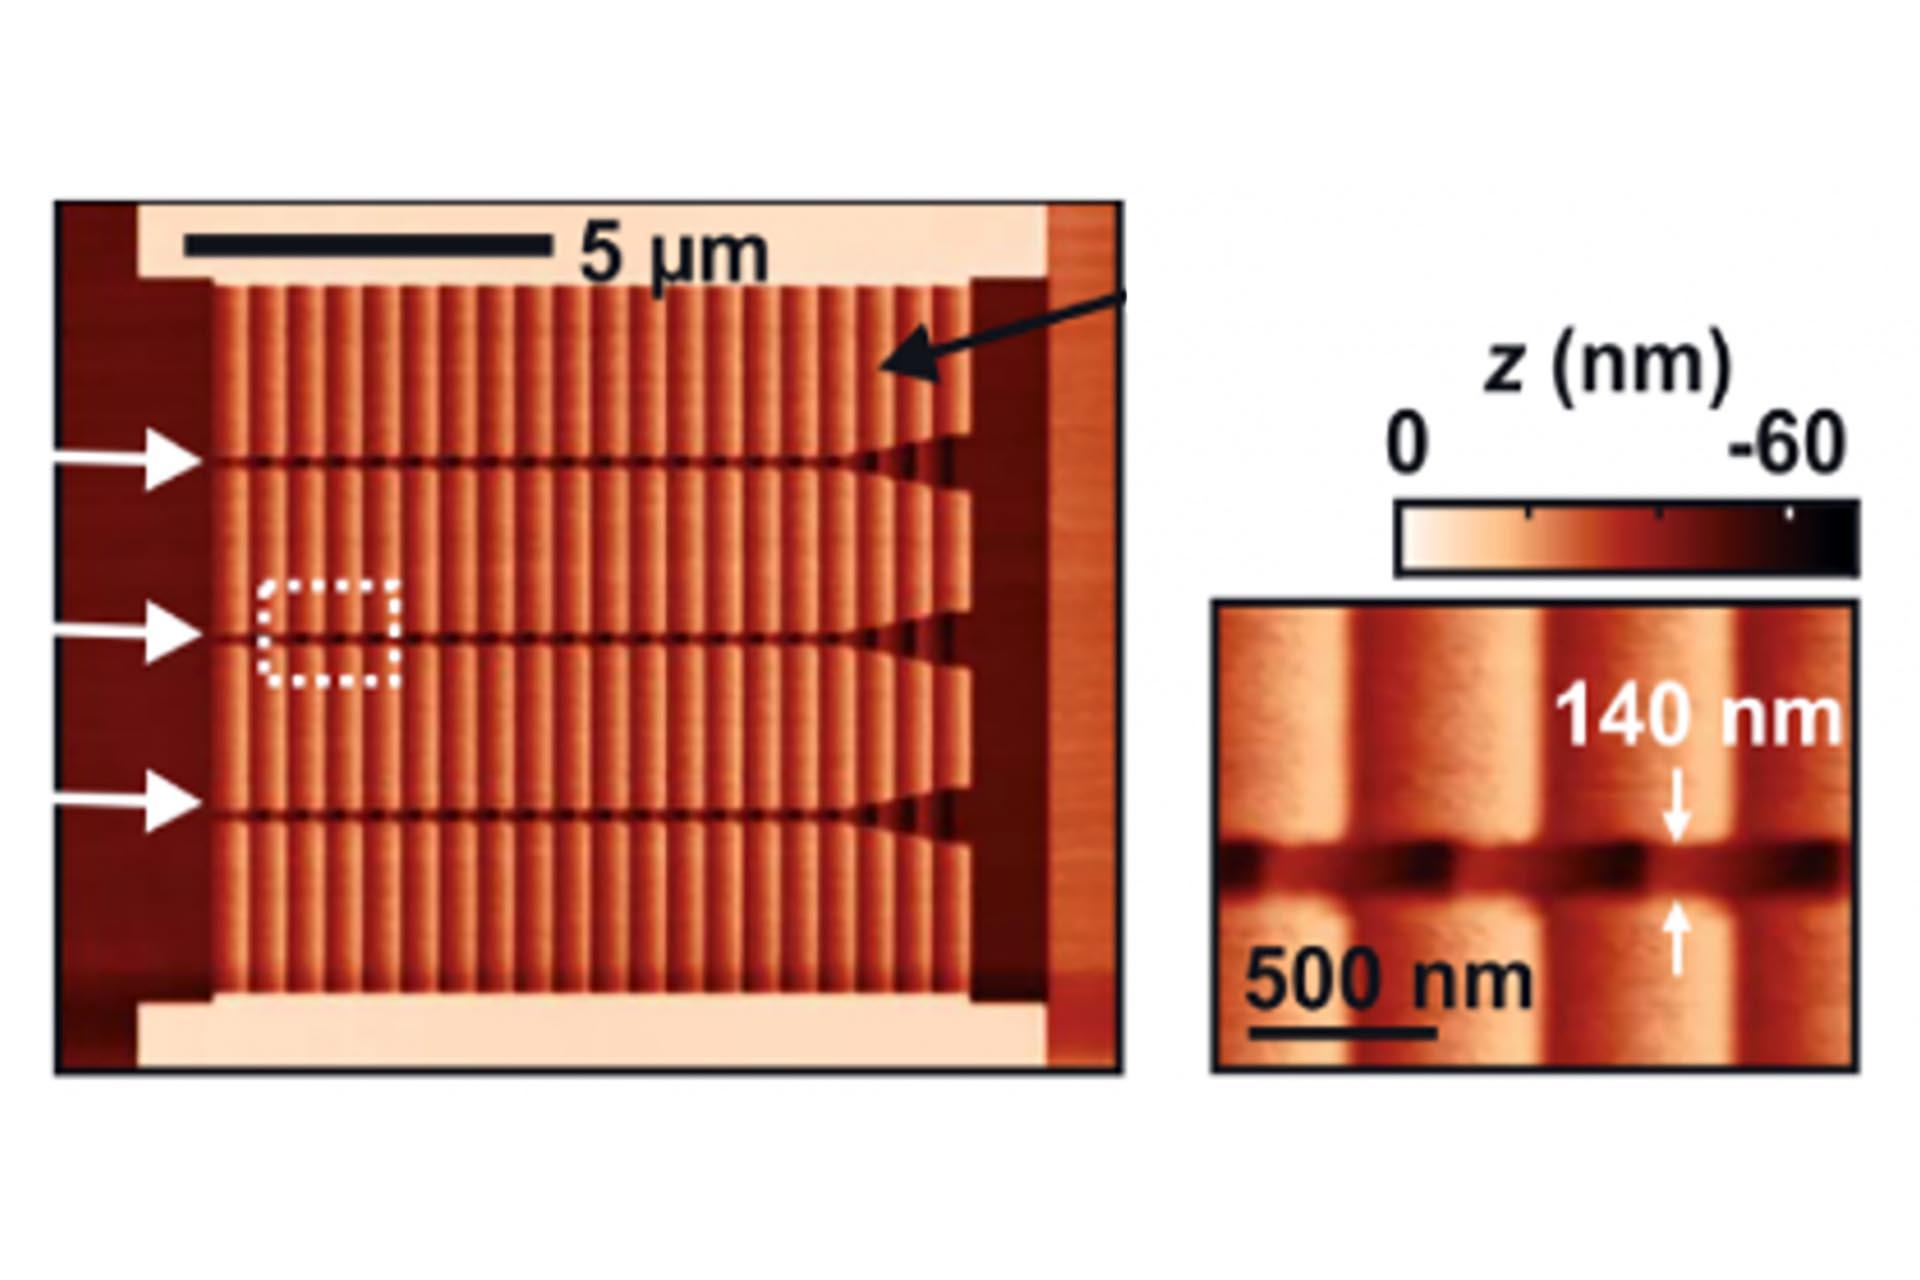 Brownian motors-based nanoparticle sorting device